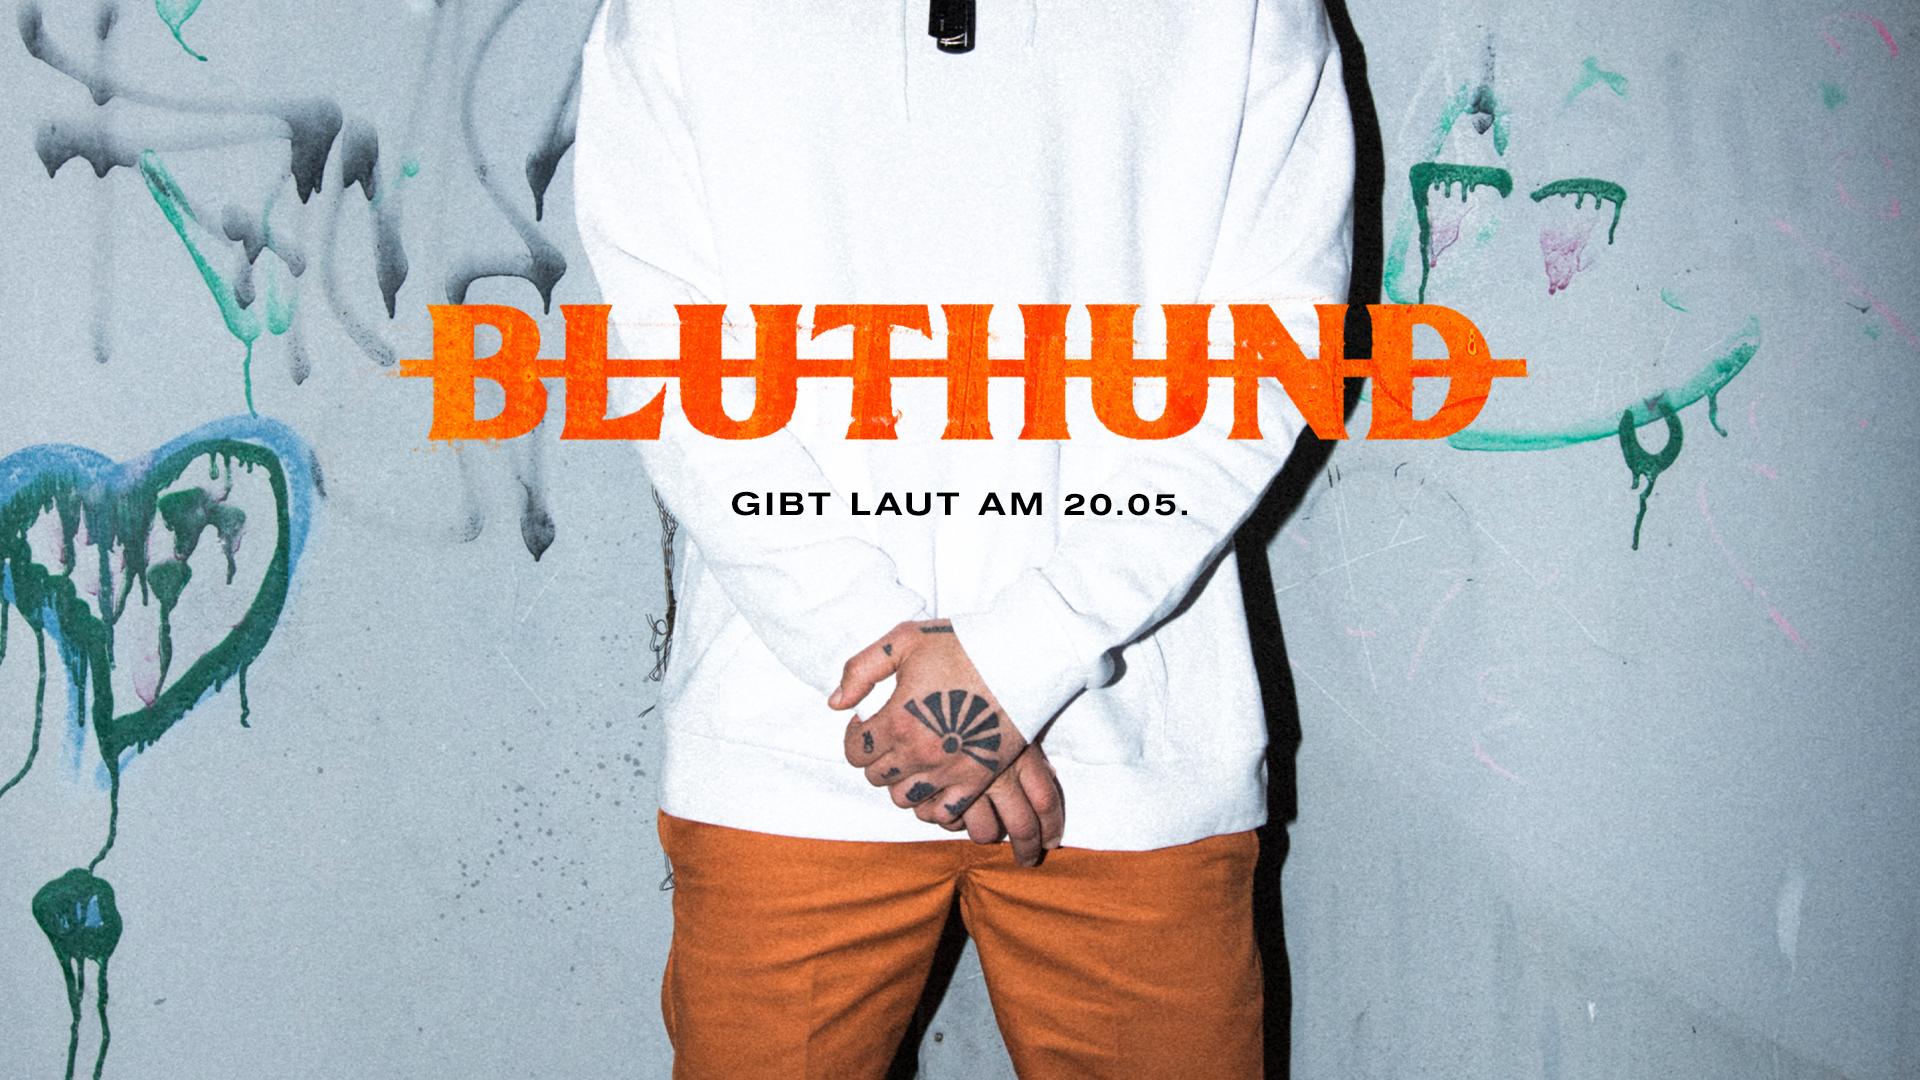 bluthund_FB_HEAD_phase_1